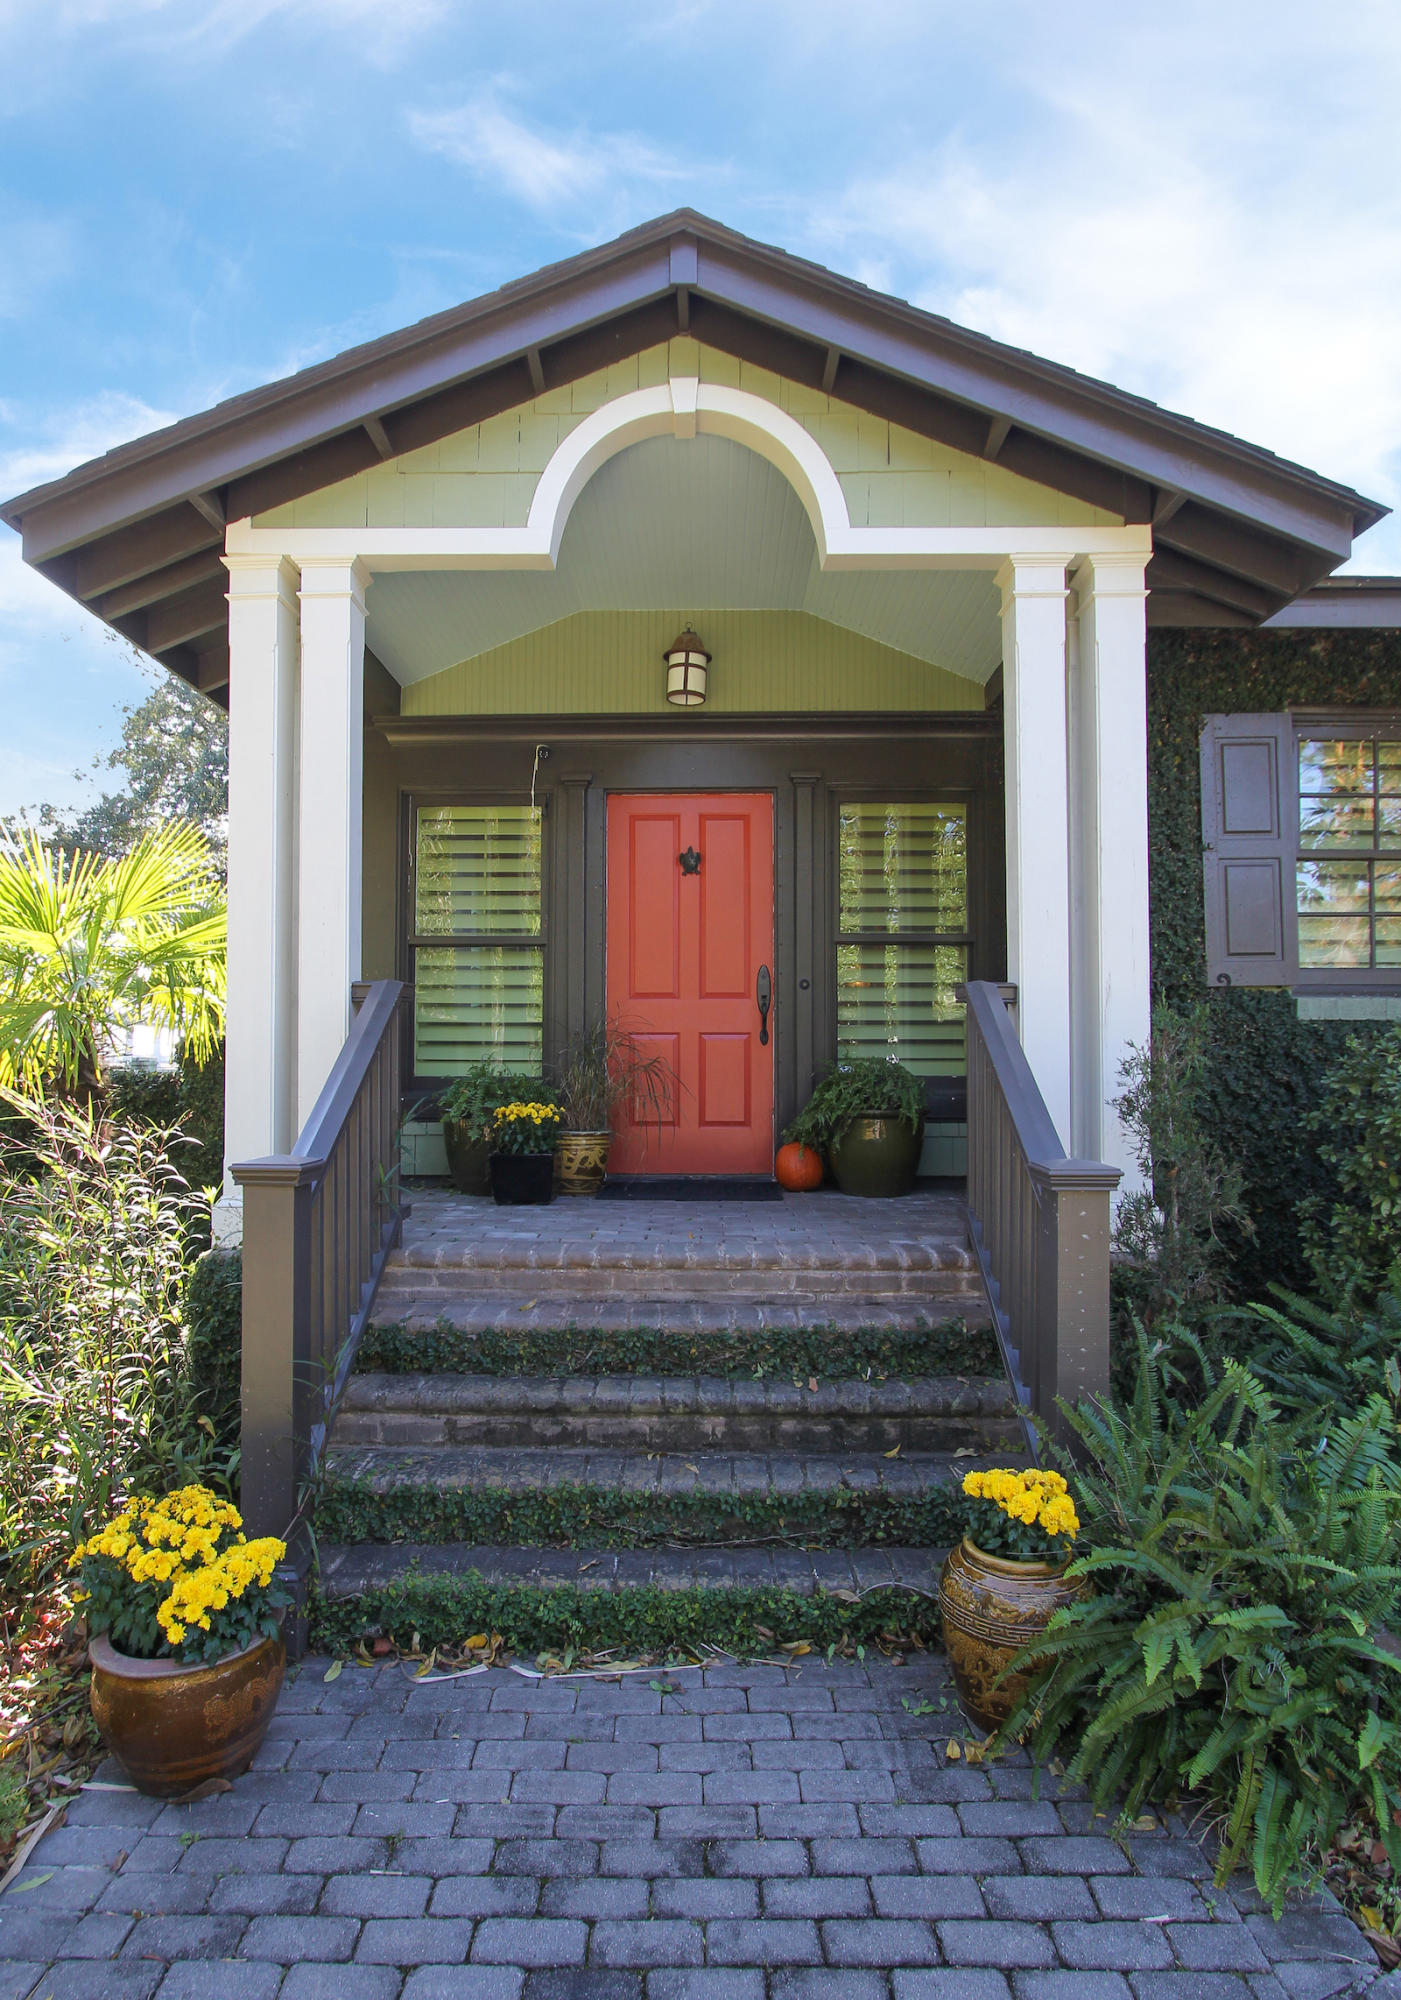 Albemarle Point Homes For Sale - 3 Albemarle, Charleston, SC - 27